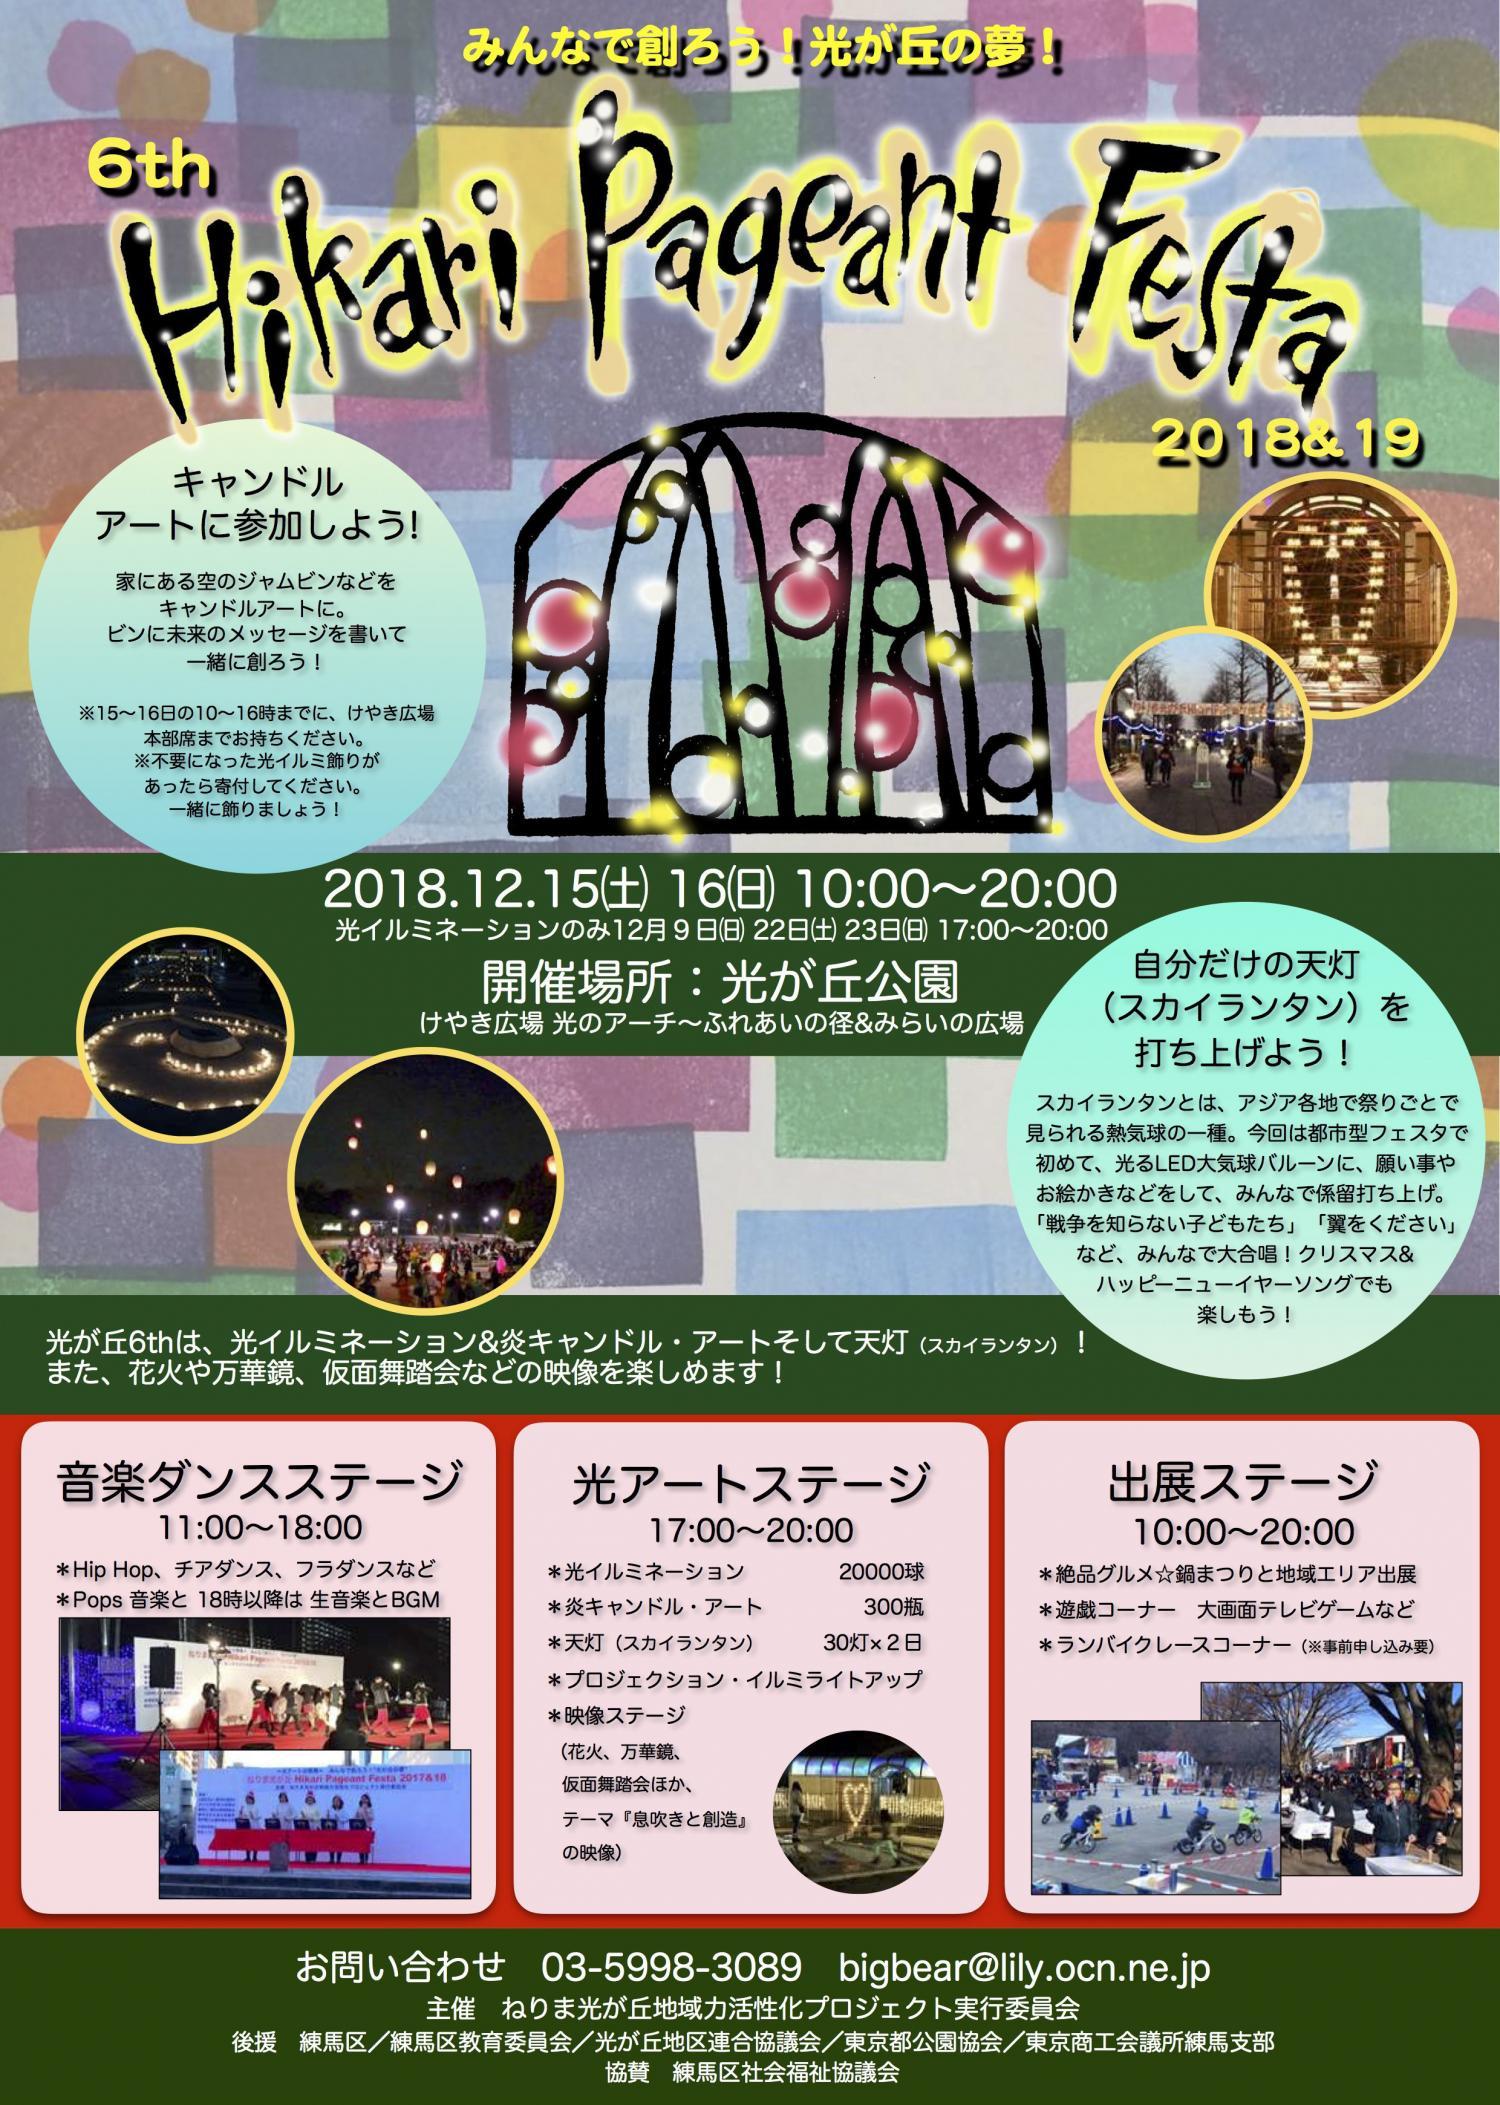 Hikari Pageant Festa 2018